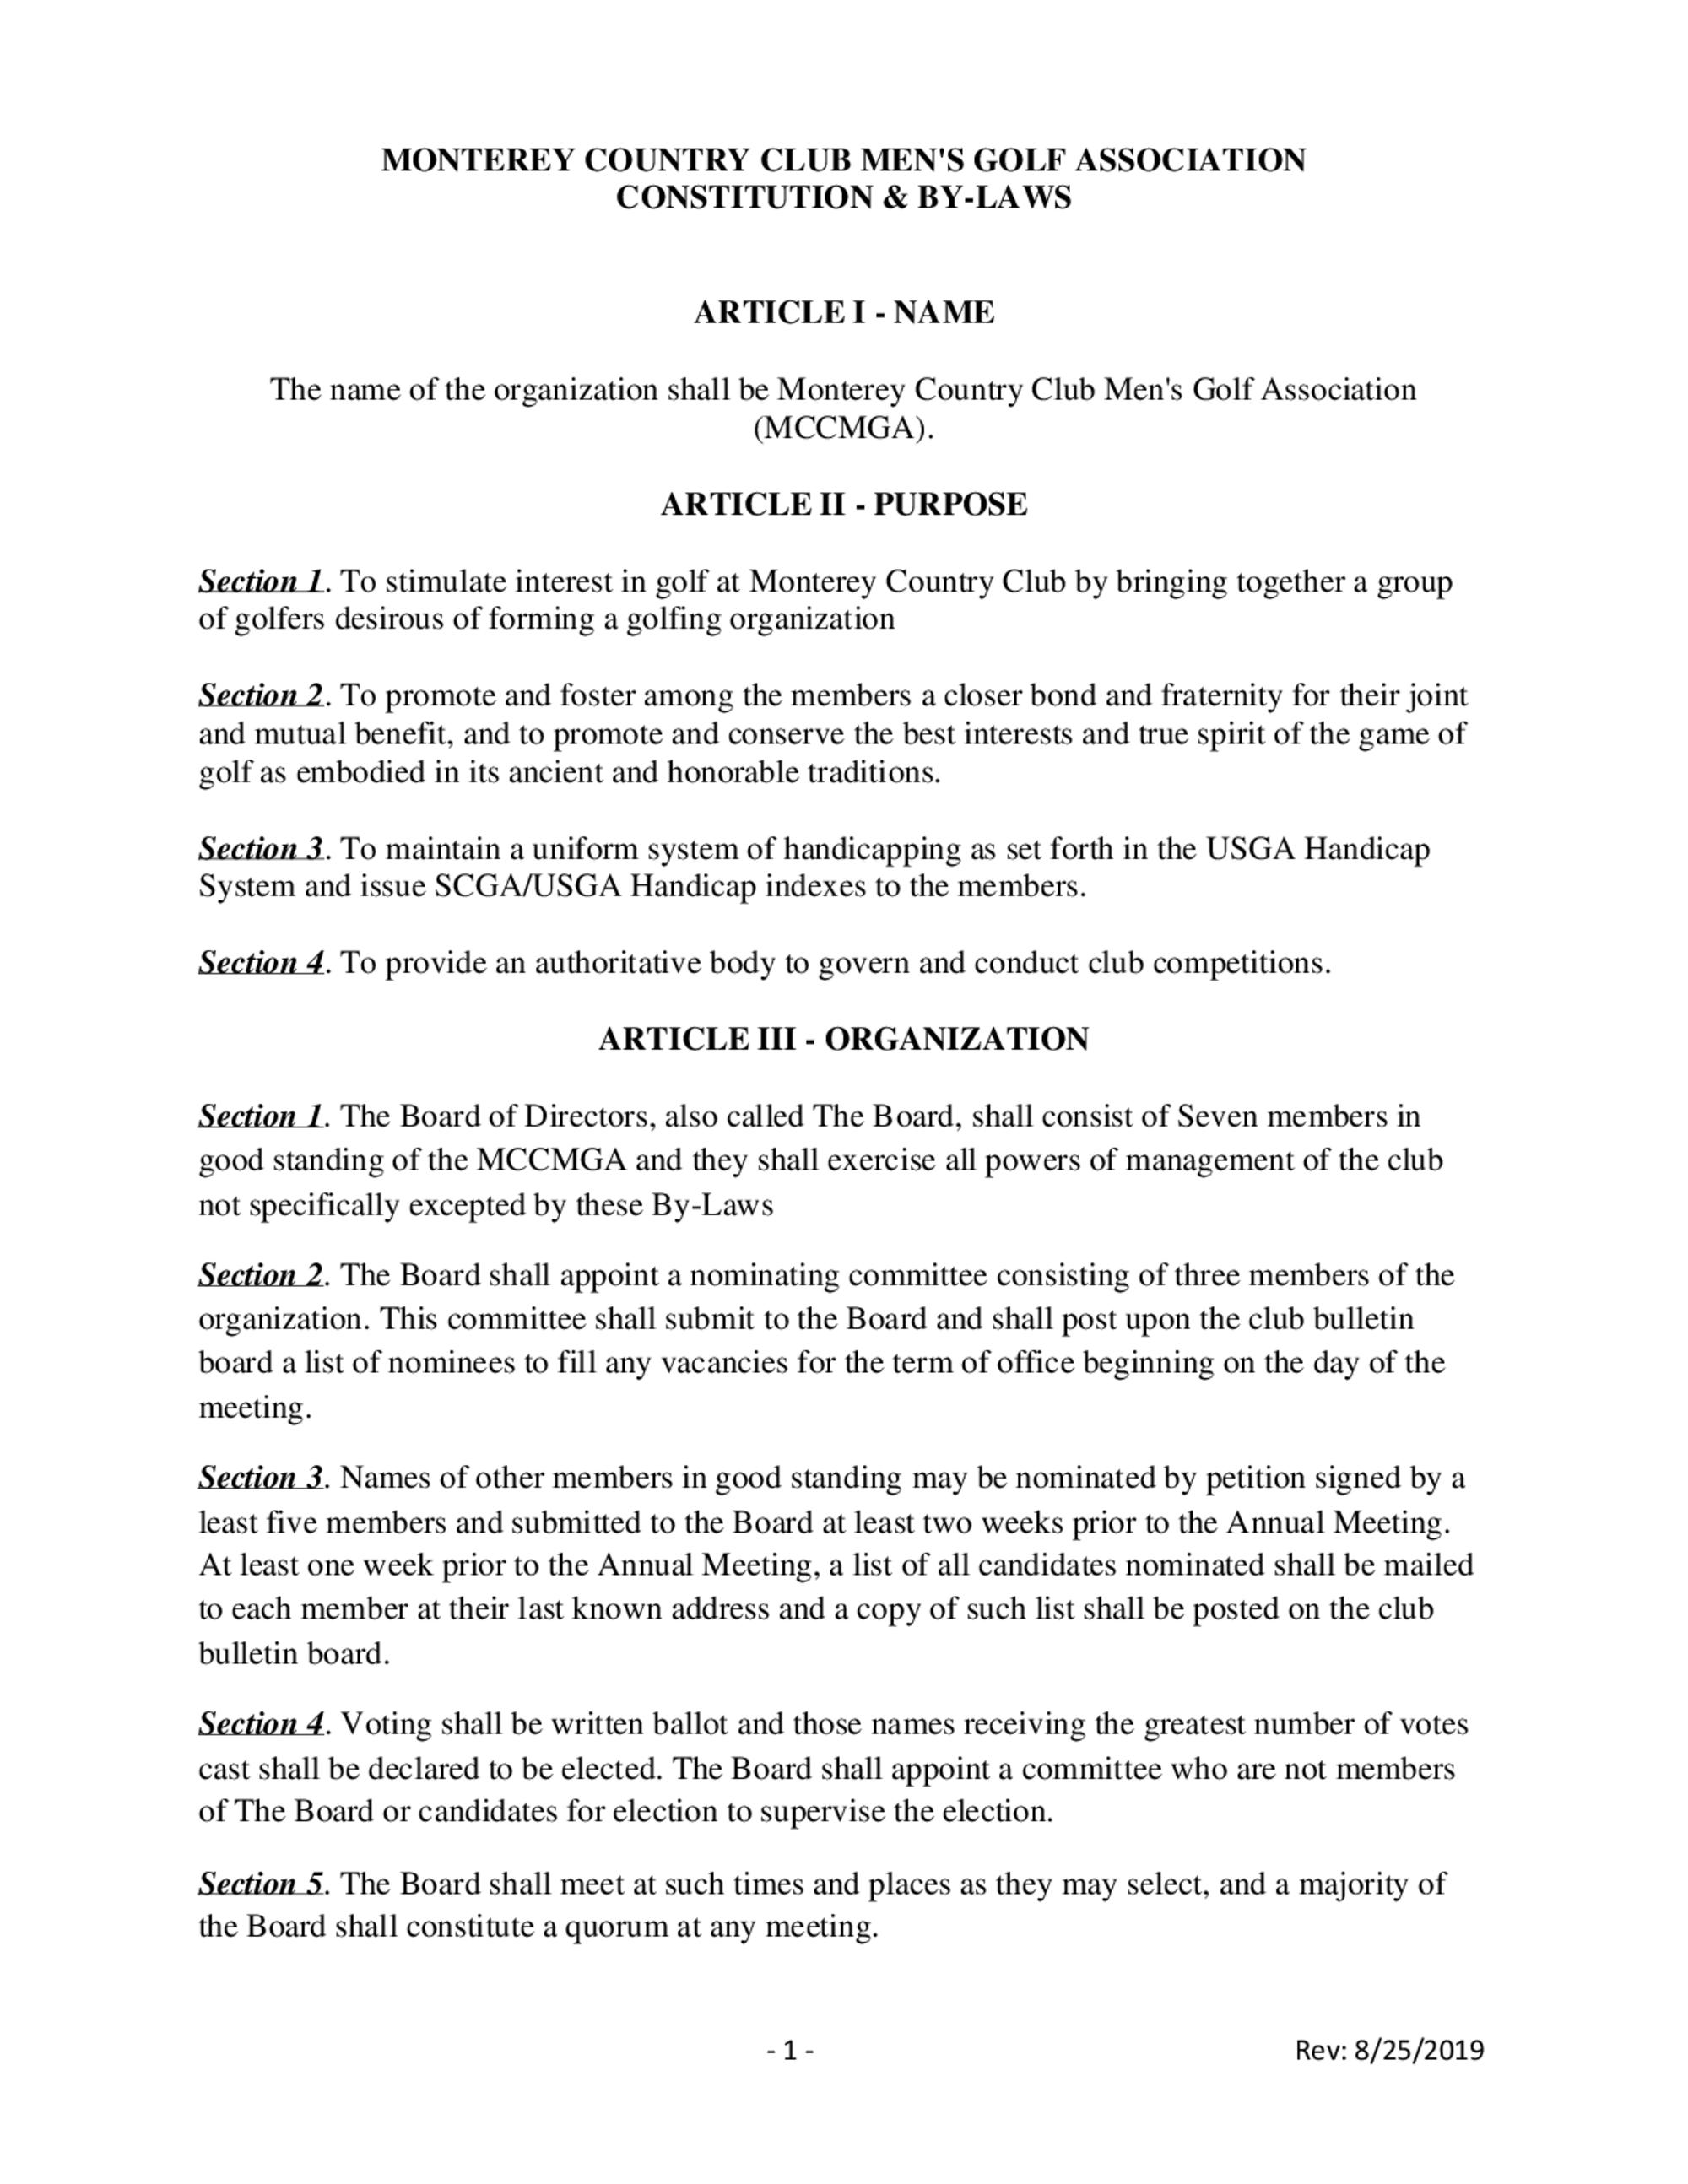 Mcc bylaws final 1